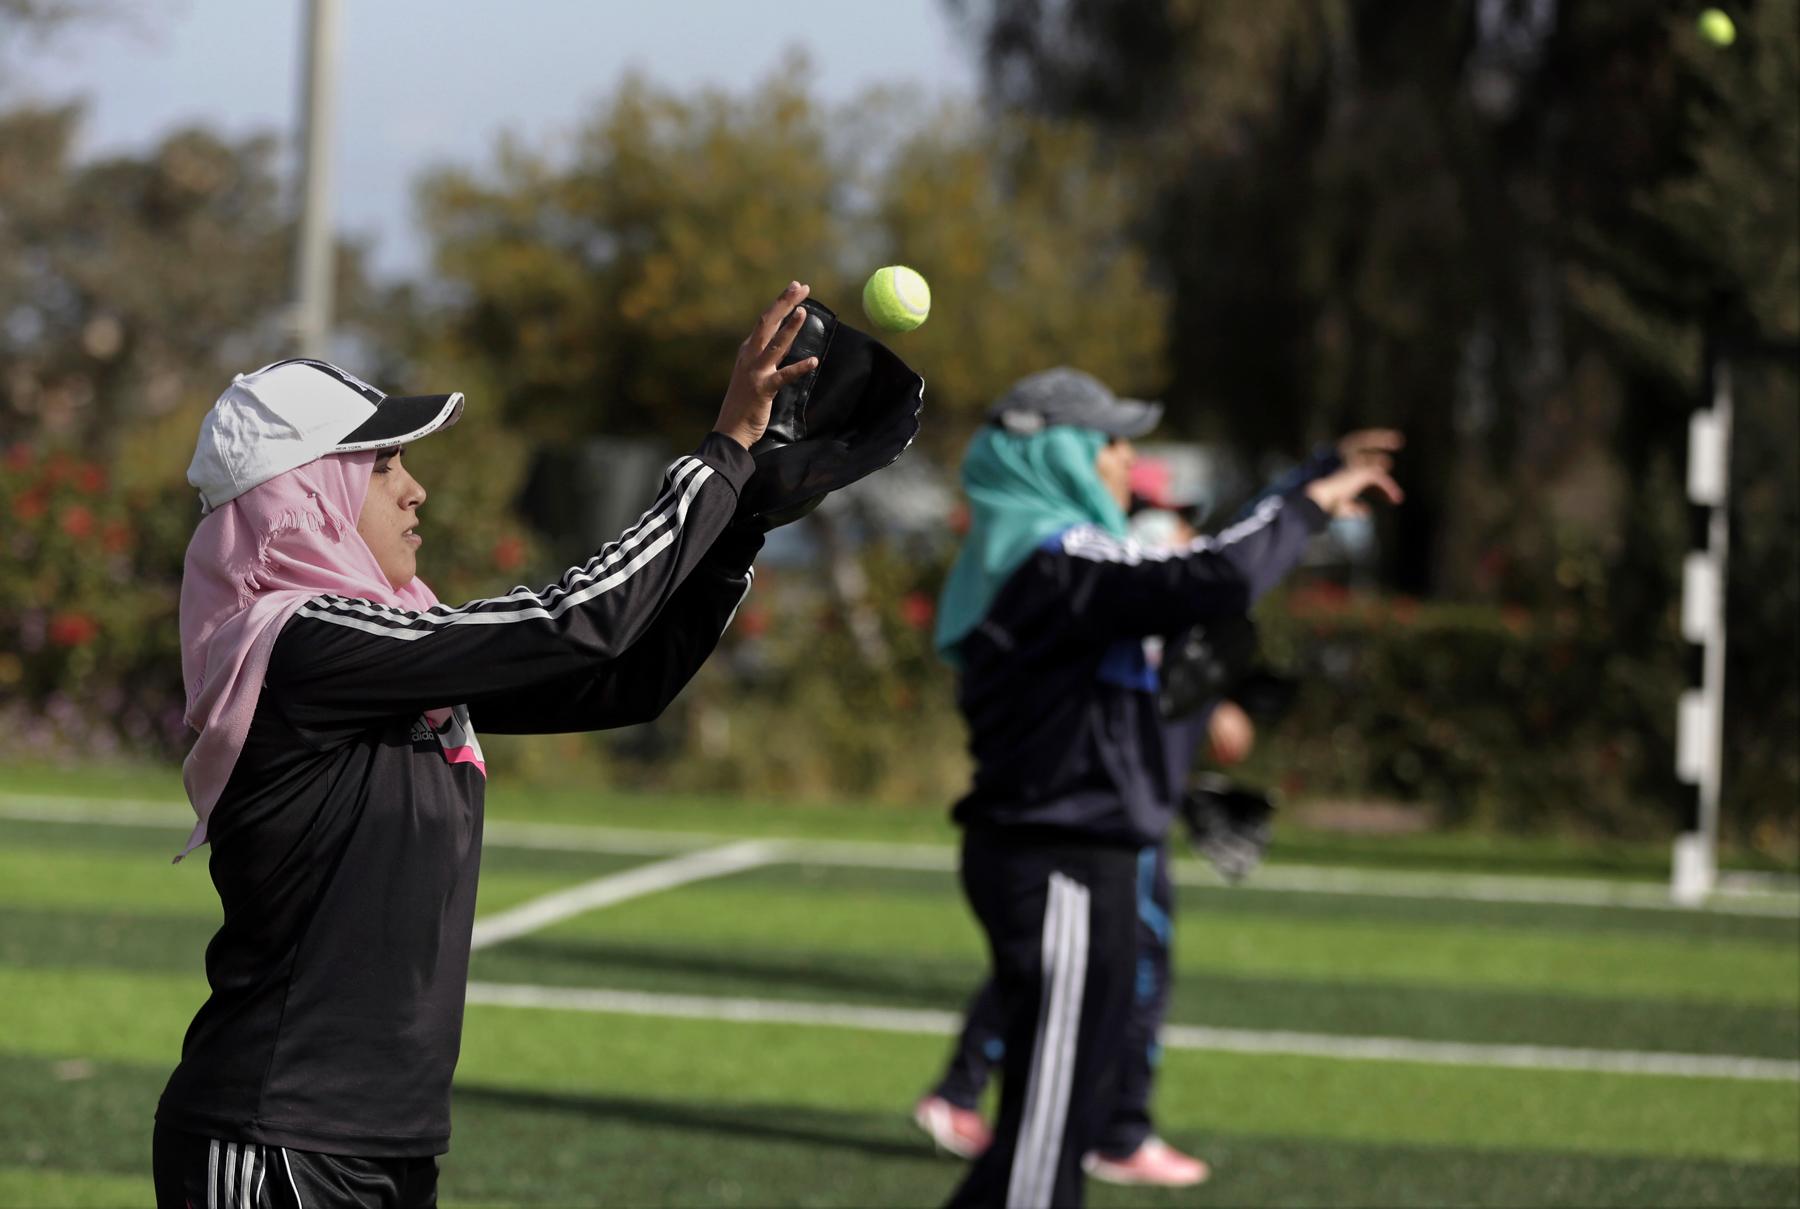 Palestinian women tossing tennis balls (© AP Images)